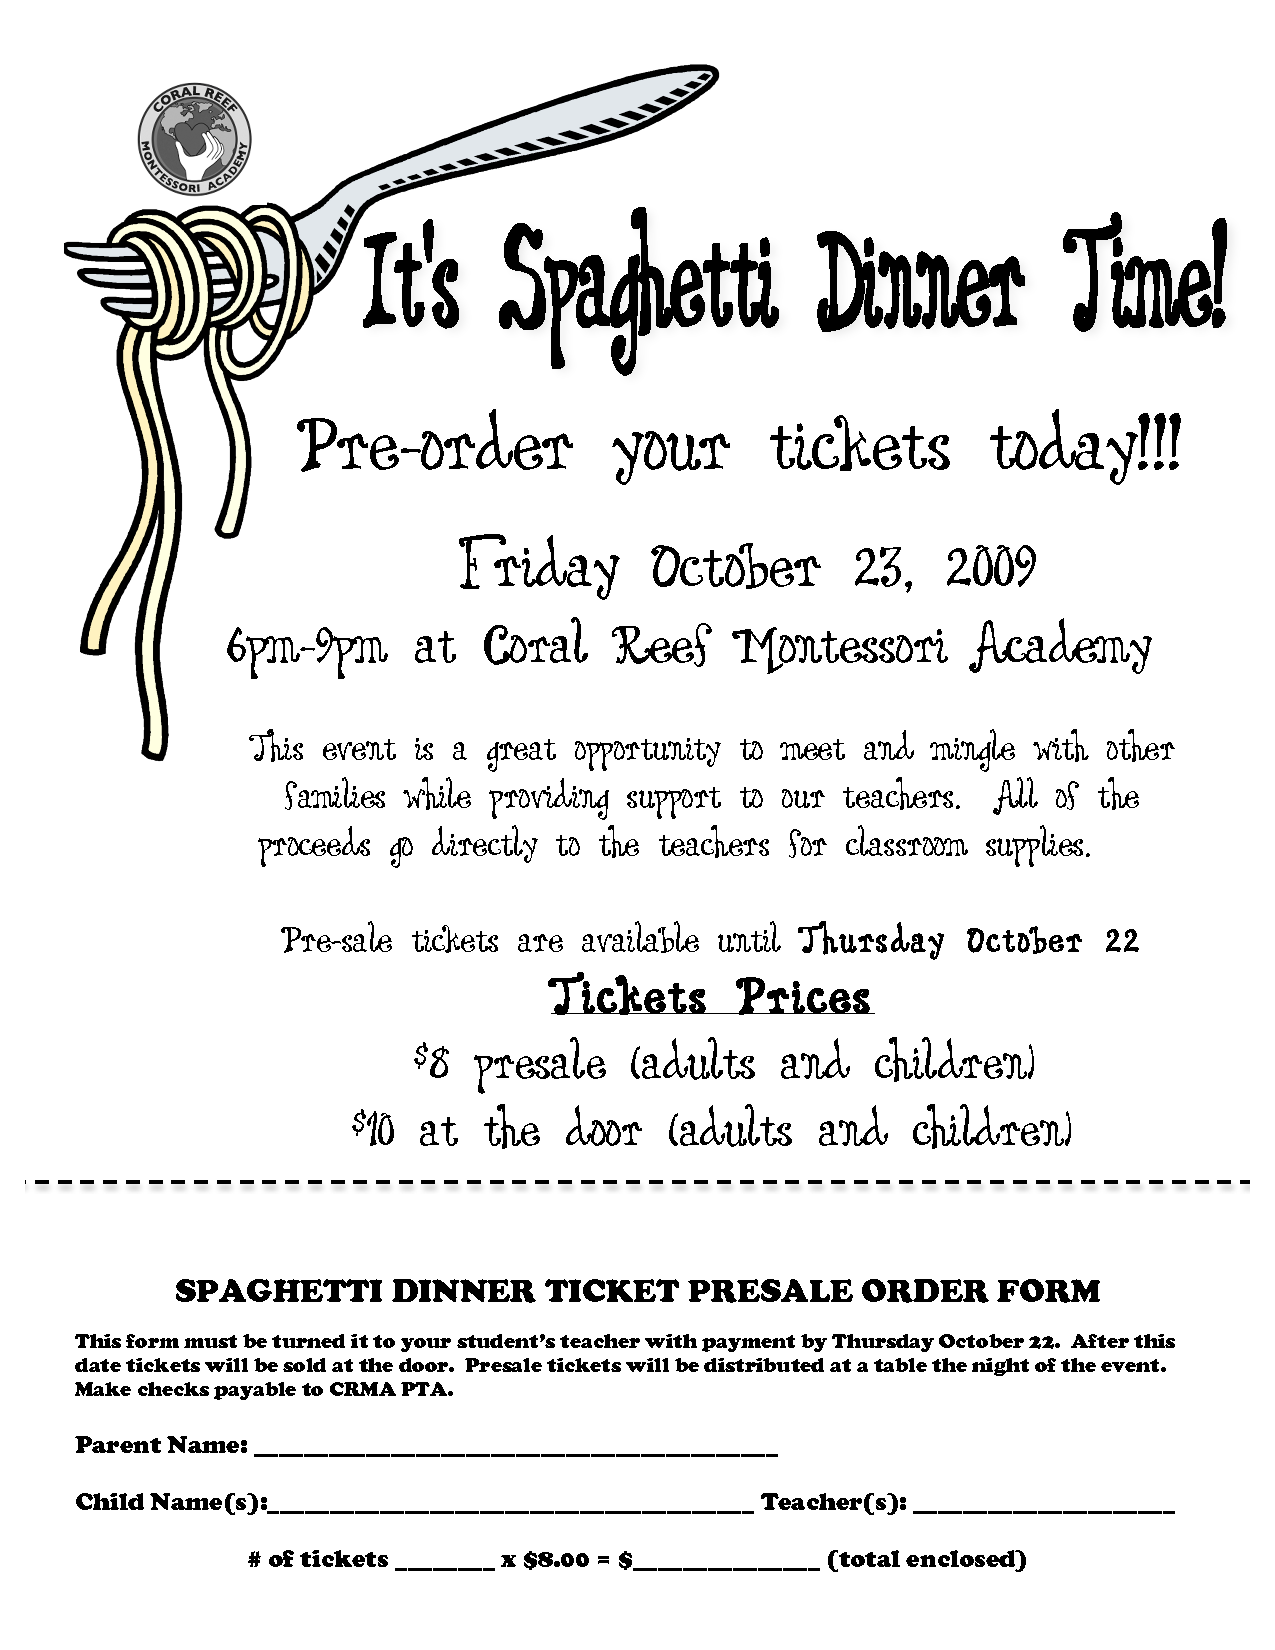 Spaghetti dinner ticket template spaghetti dinner ticket for Fundraiser dinner tickets template